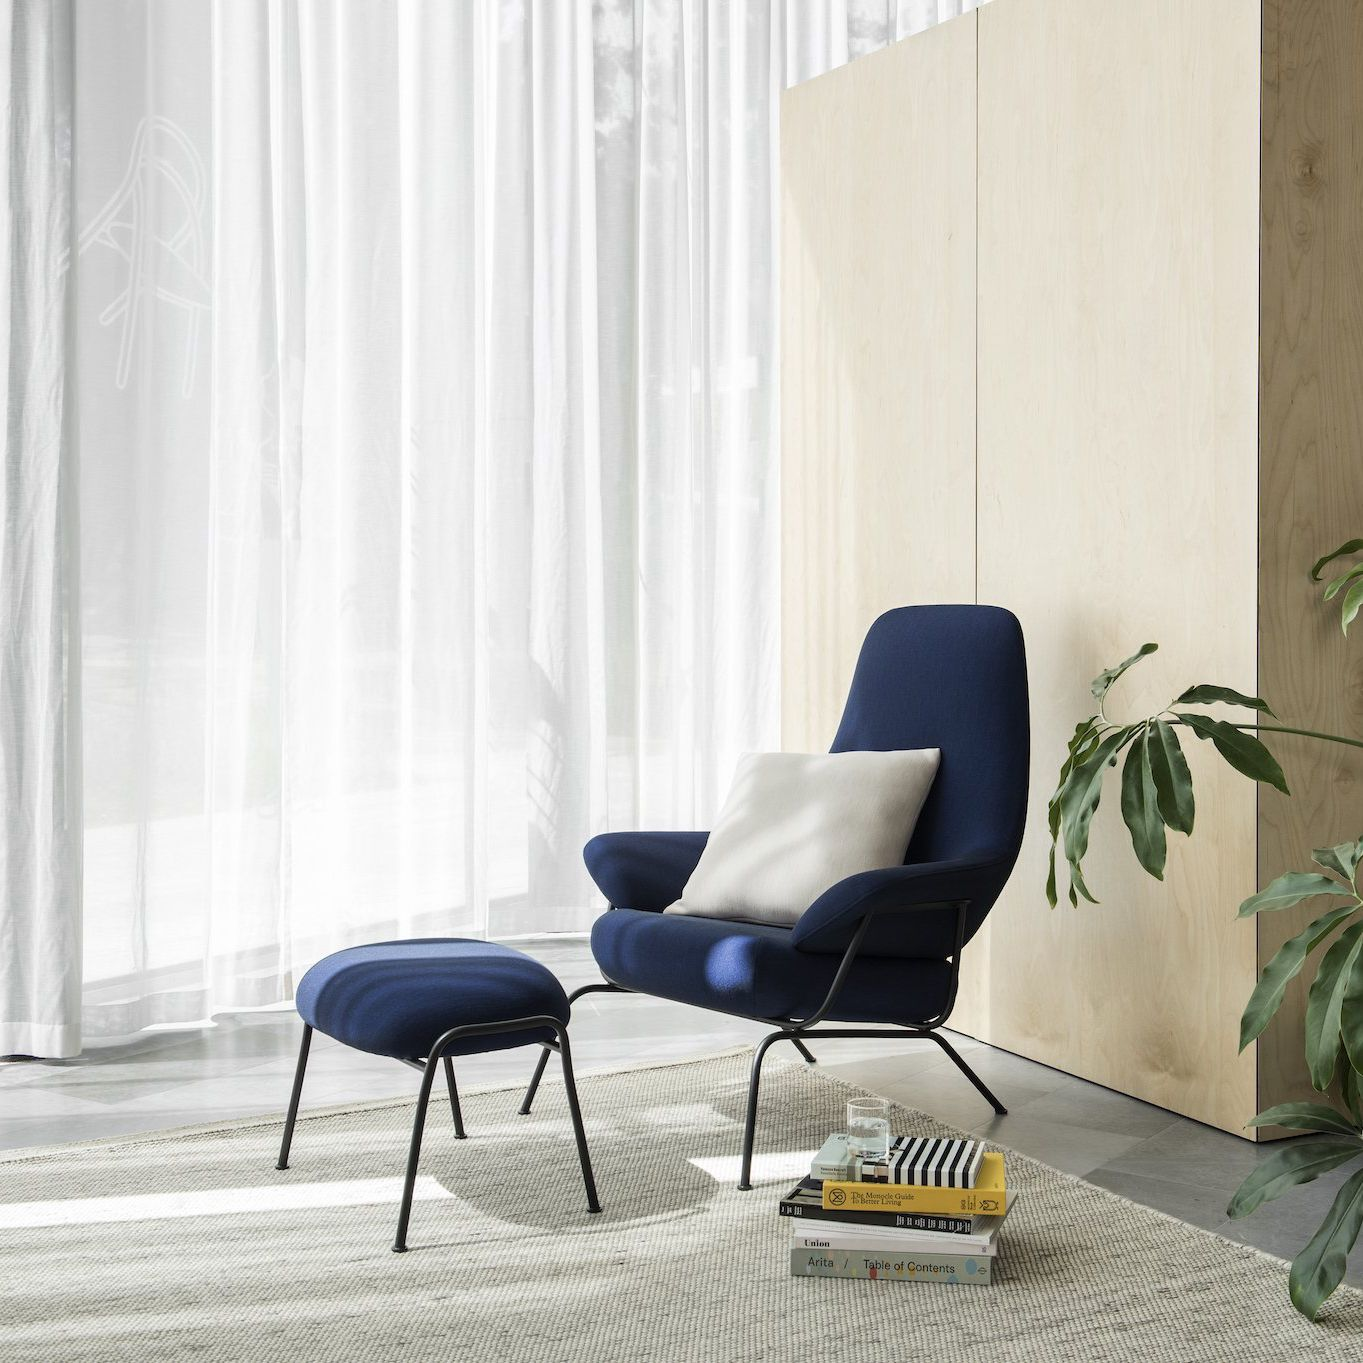 Contemporary armchair / fabric / metal / with footrest - HAI - hem